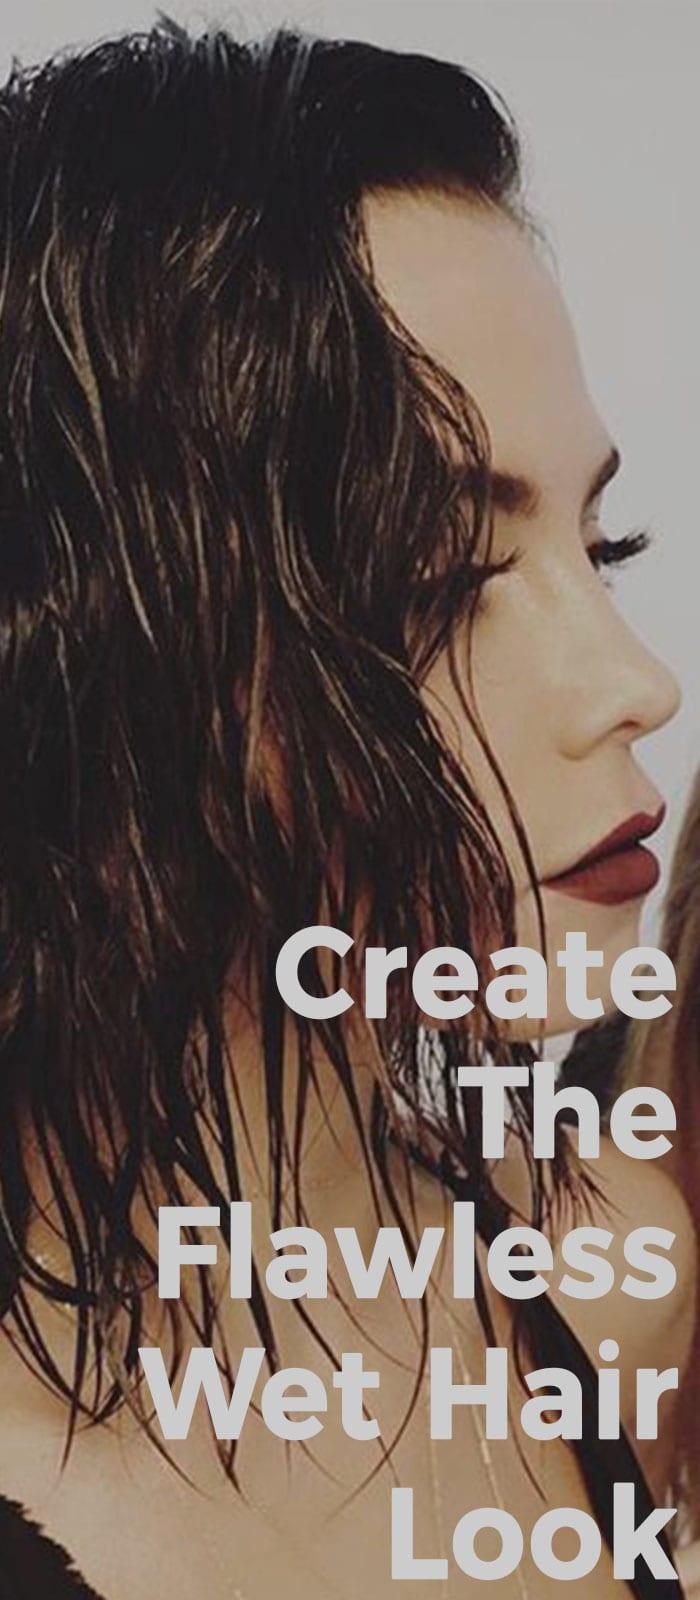 Create The Flawless Wet Hair Look